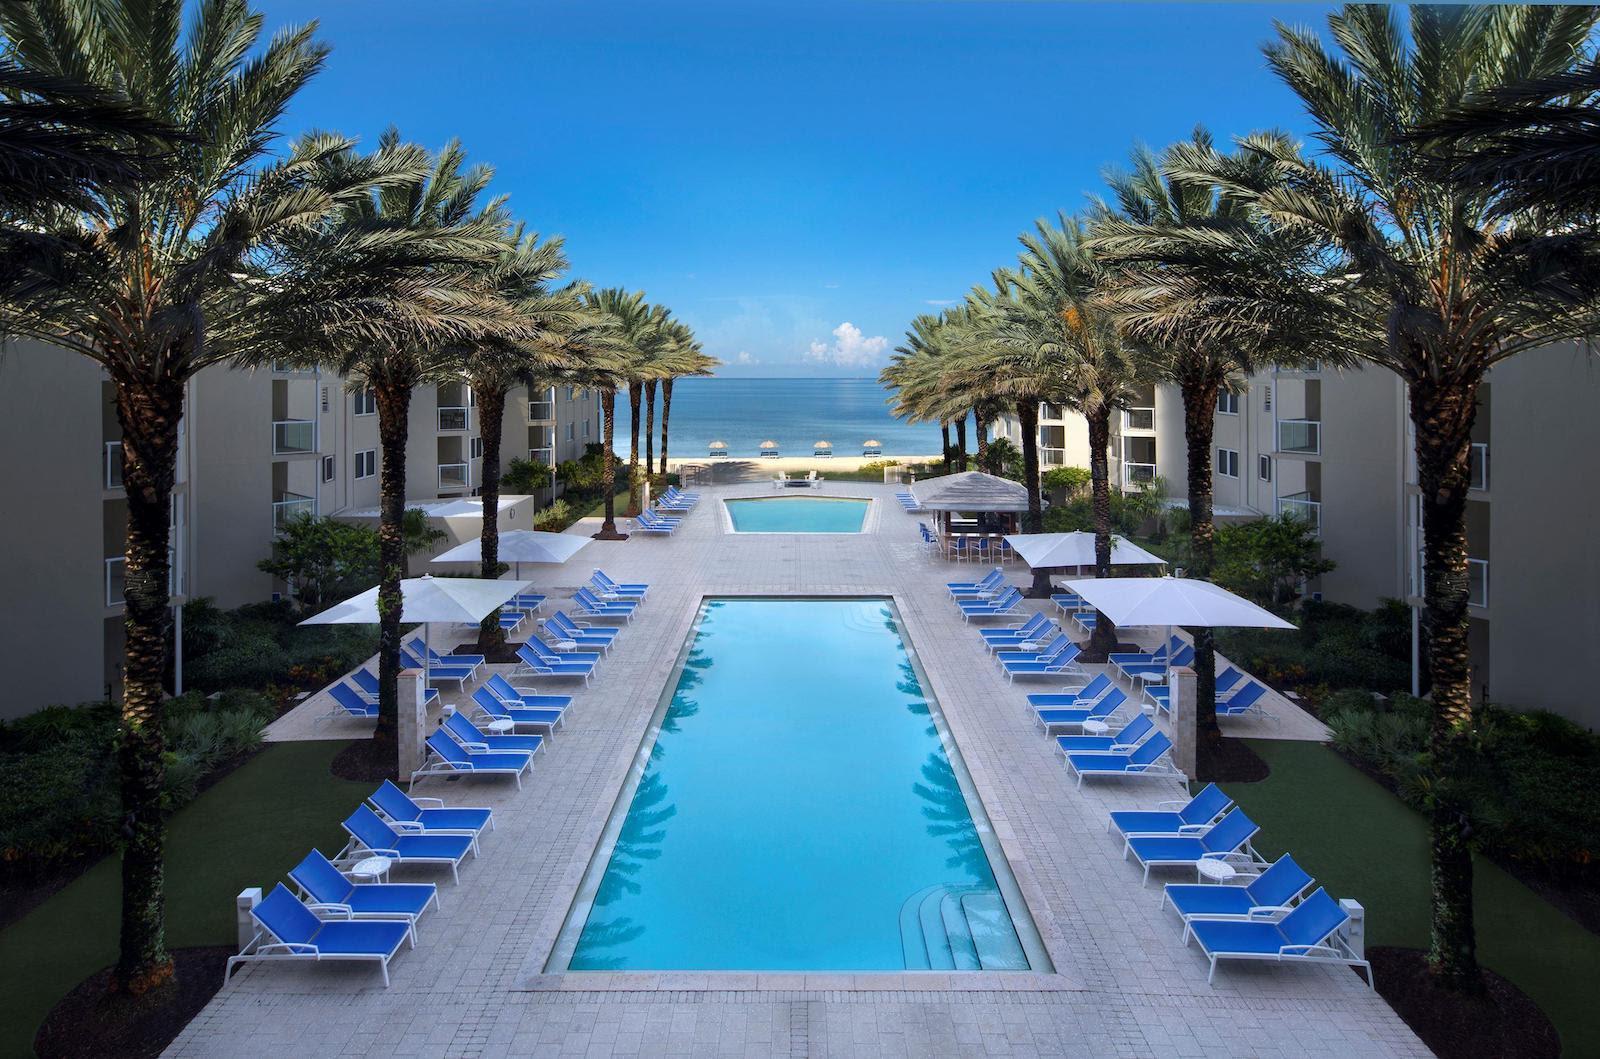 Edgewater Beach Hotel 1901 Gulf Shore Blvd N Naples FL